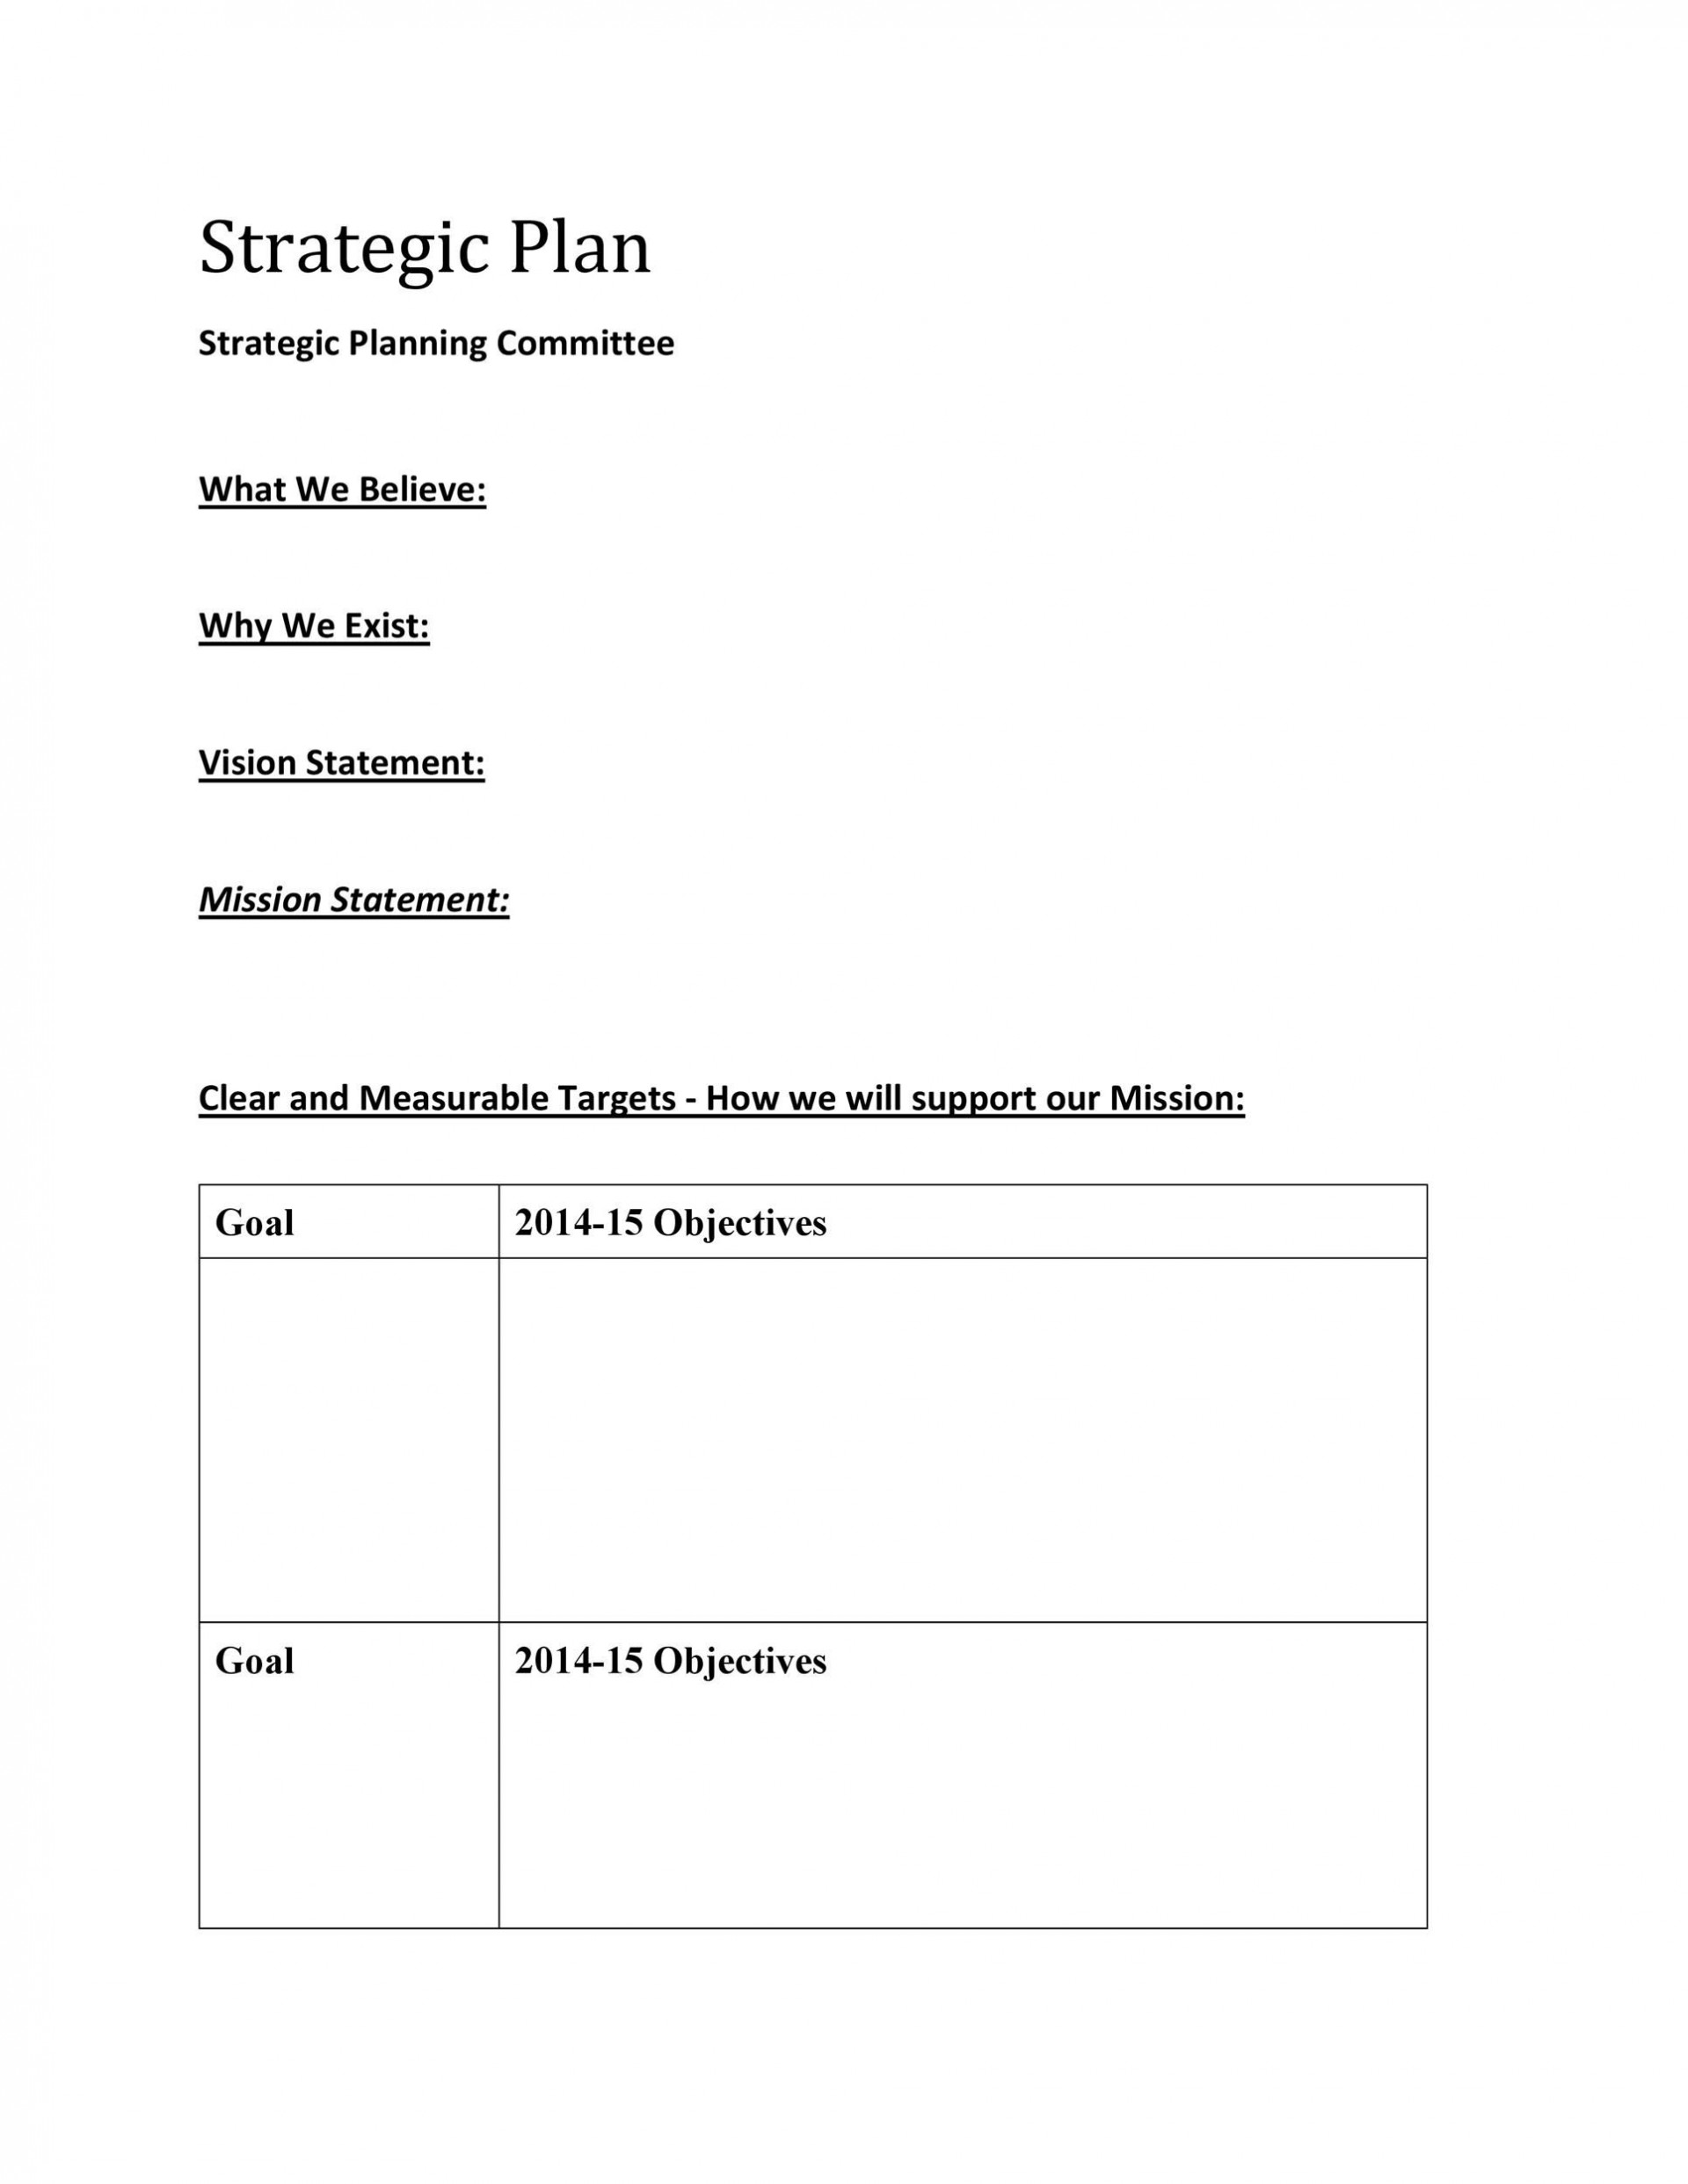 008 Top Strategic Plan Template Word Image  Format Busines Doc1920